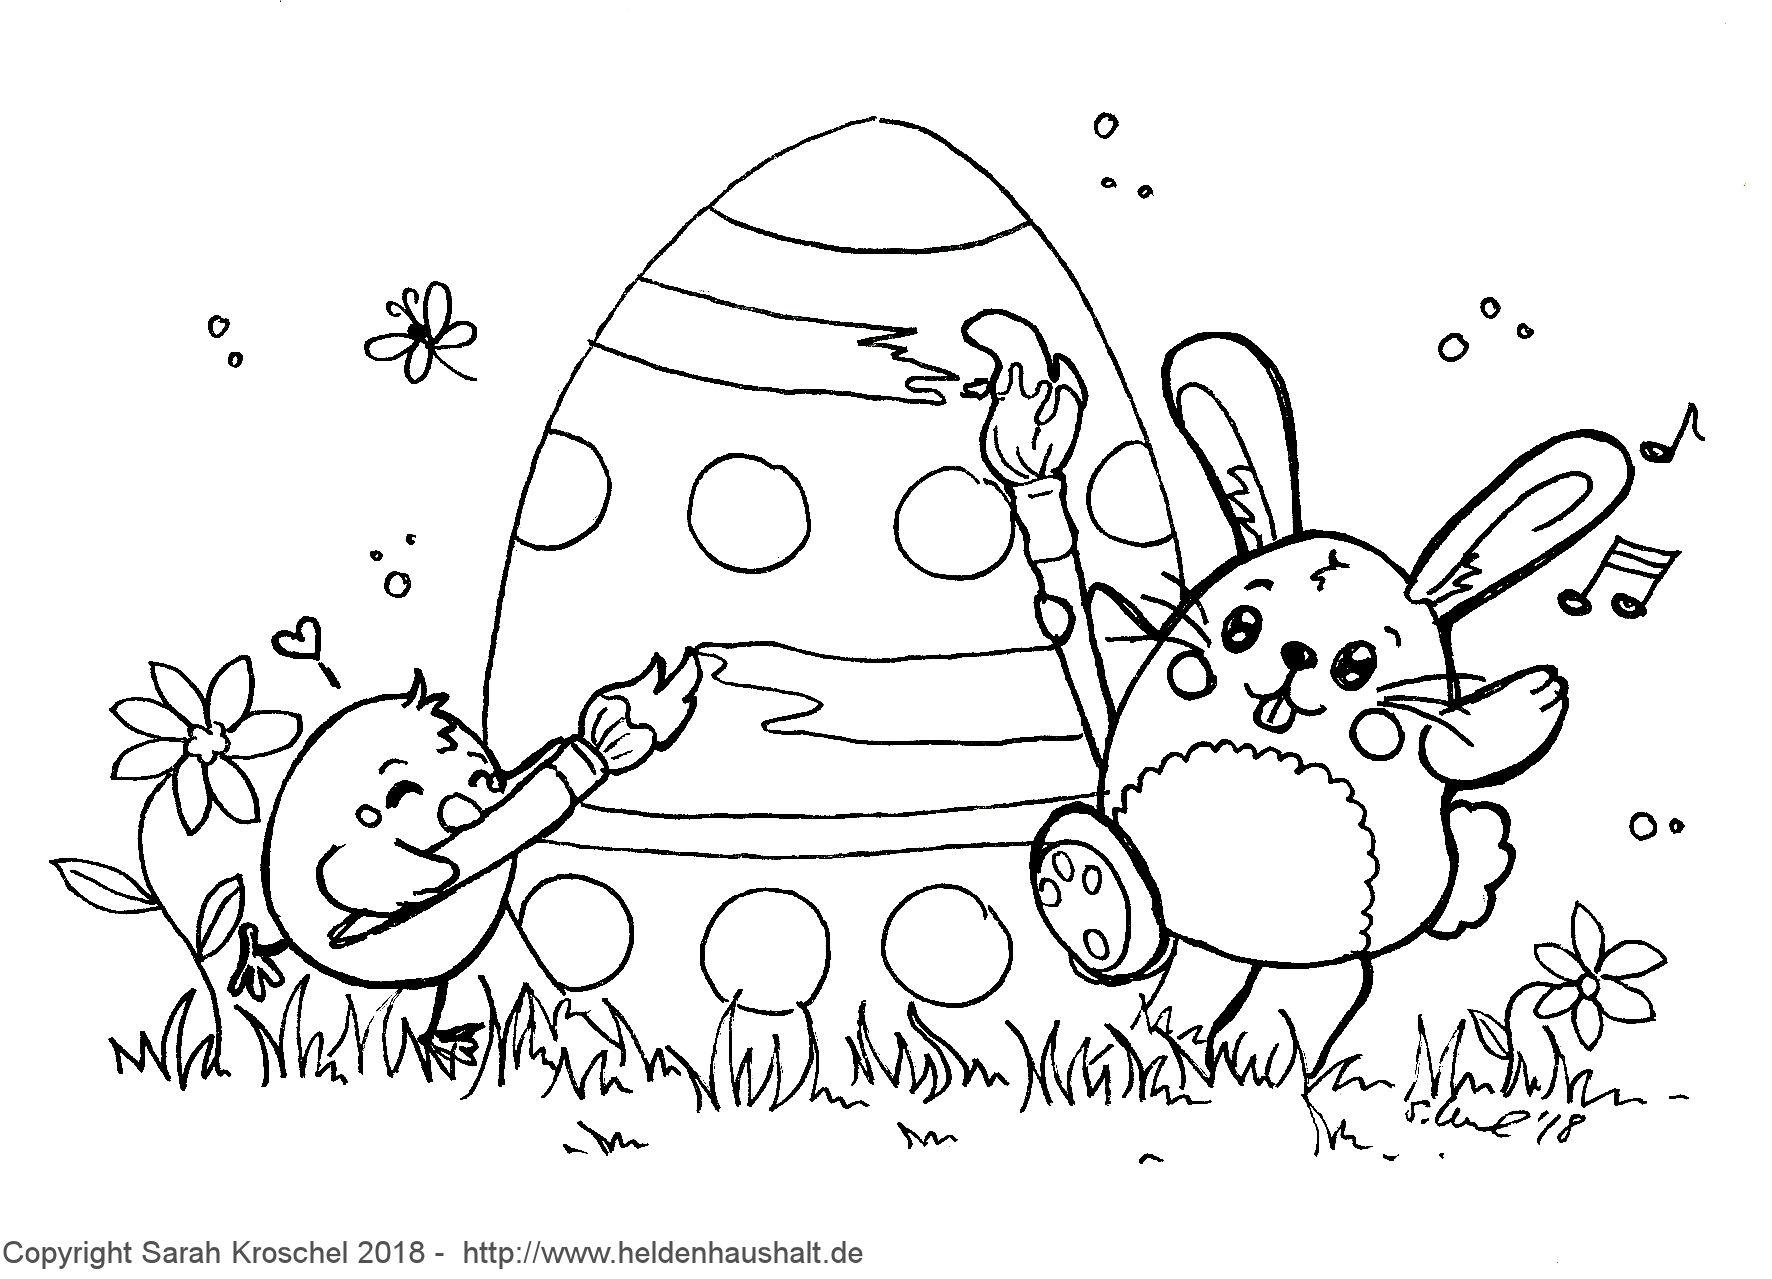 Ei feel good! - Wir wünschen frohe Ostern! #Ausmalbild - Heldenhaushalt